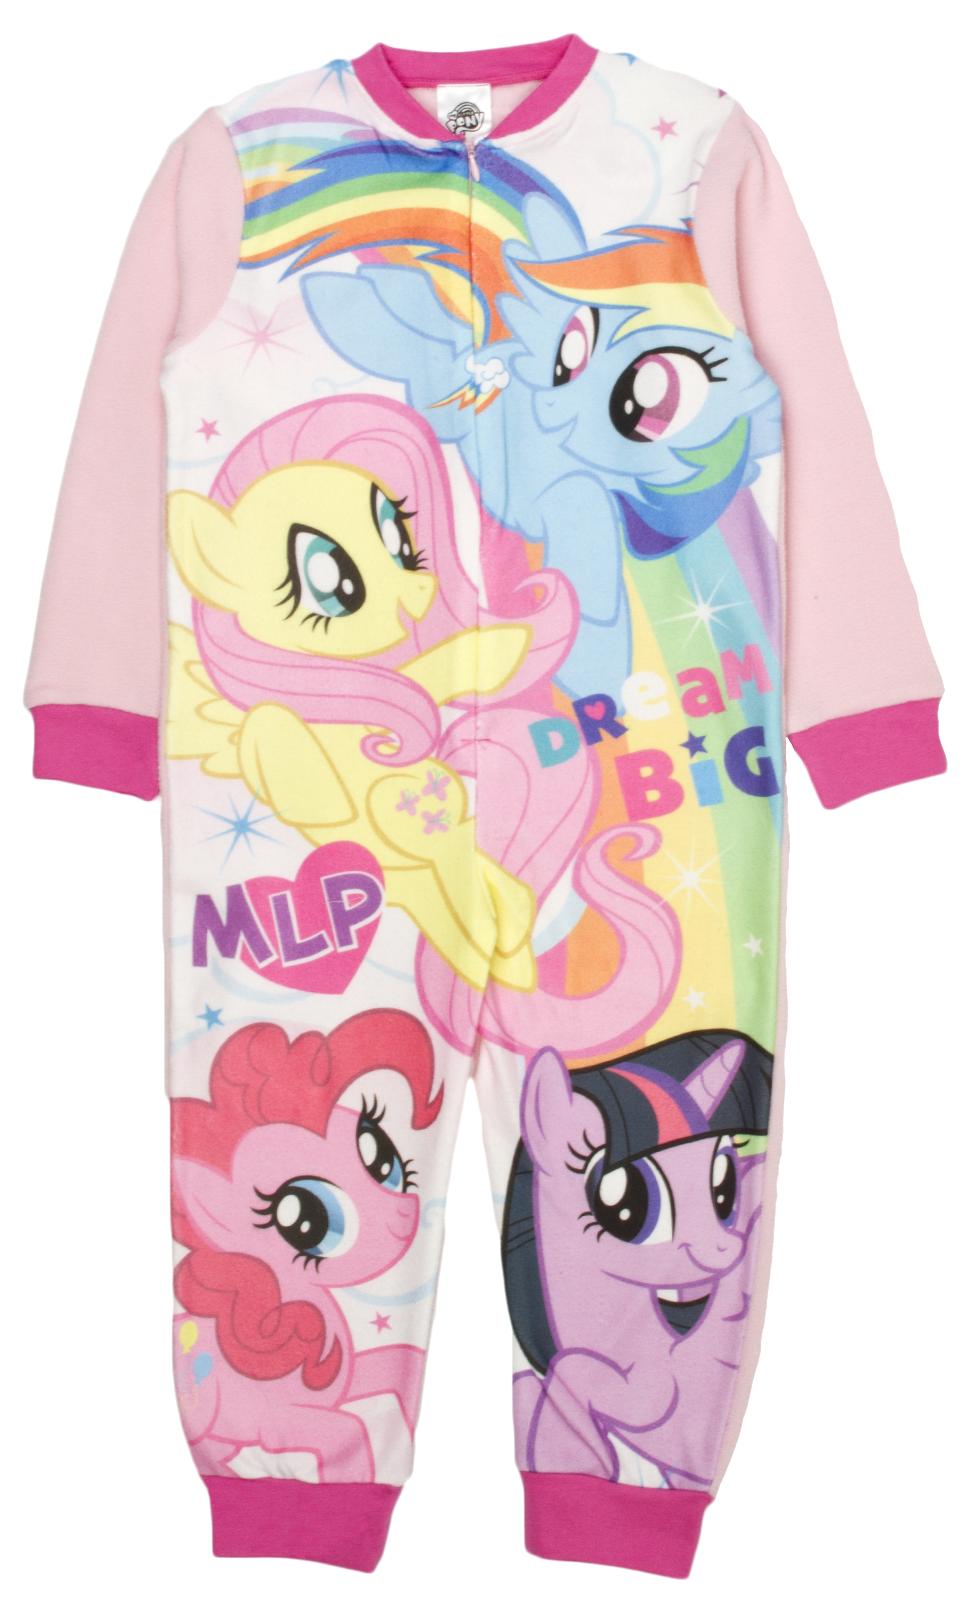 3cebde791f0a Girls My Little Pony Fleece Onezee MLP Novelty Dress Up Pyjamas PJ s ...